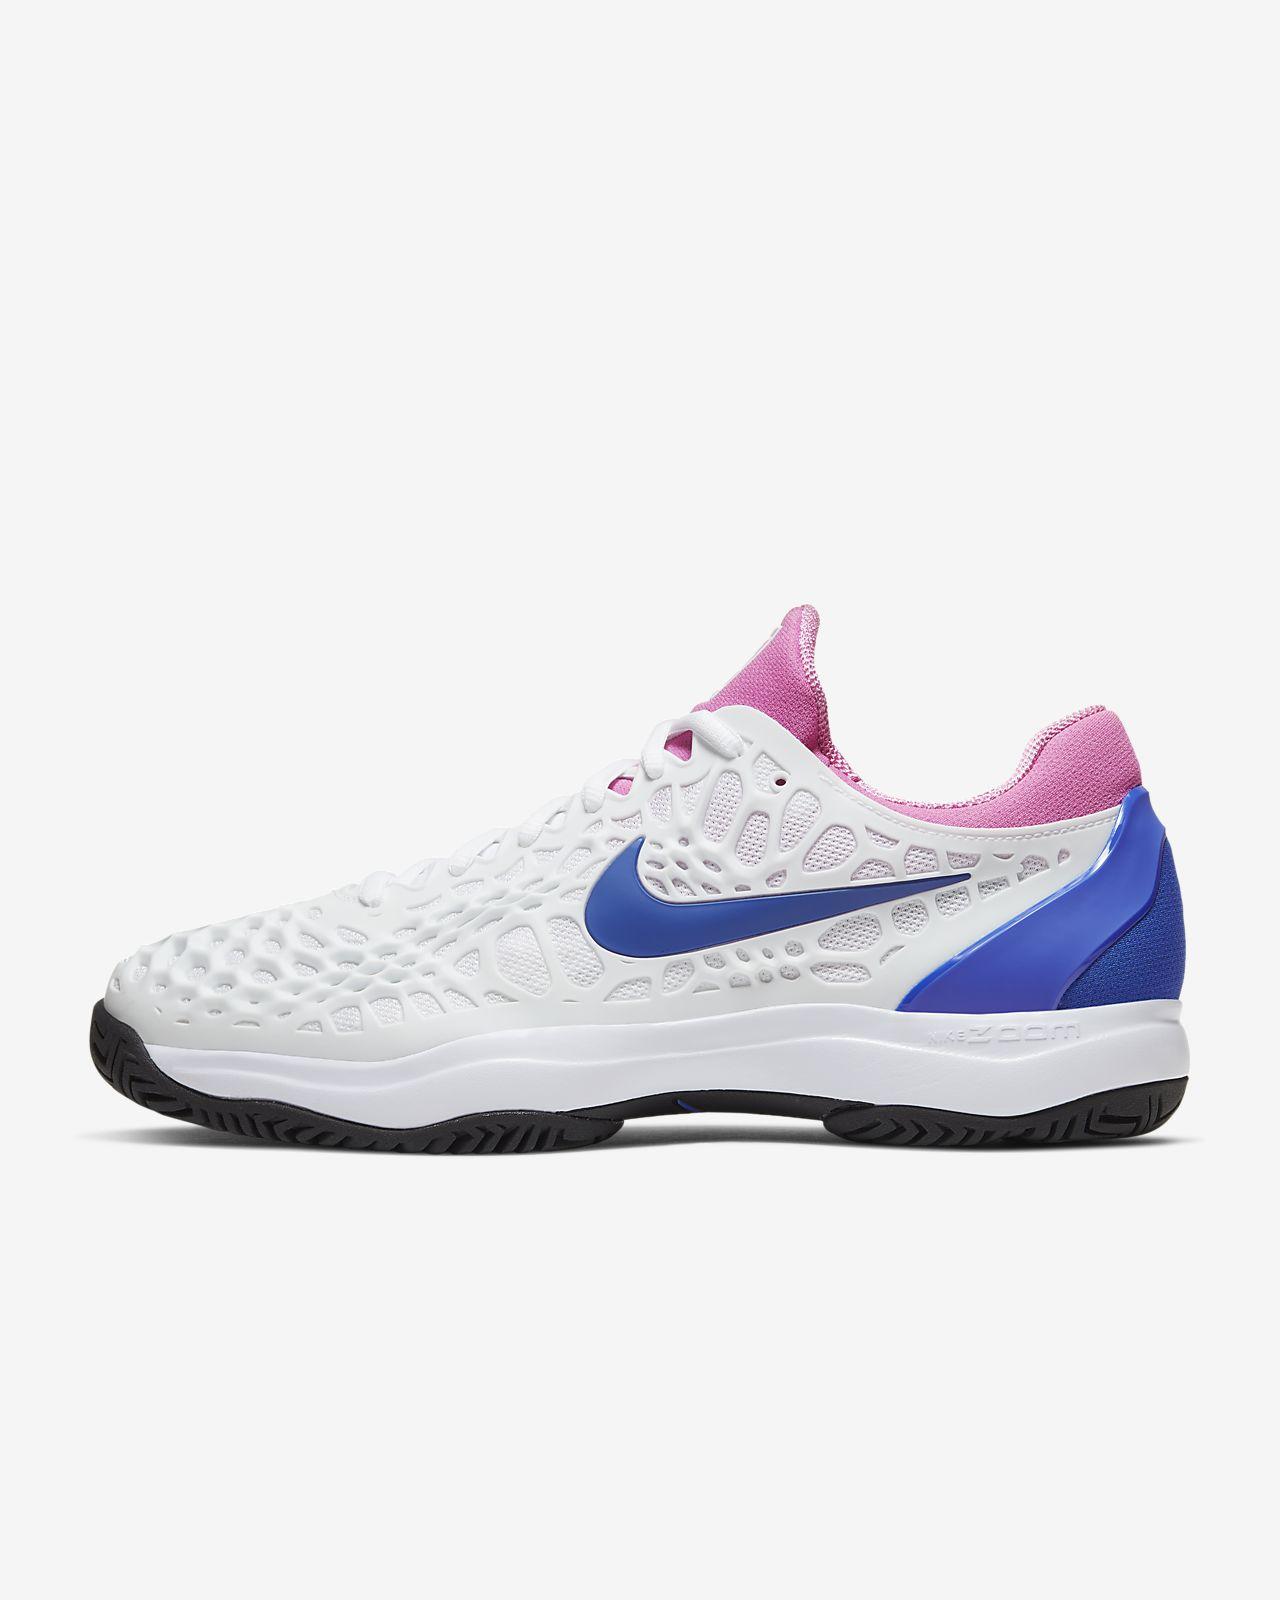 Herren Nike Schuhe For Sale 2019 Basketball Nike Court Tour